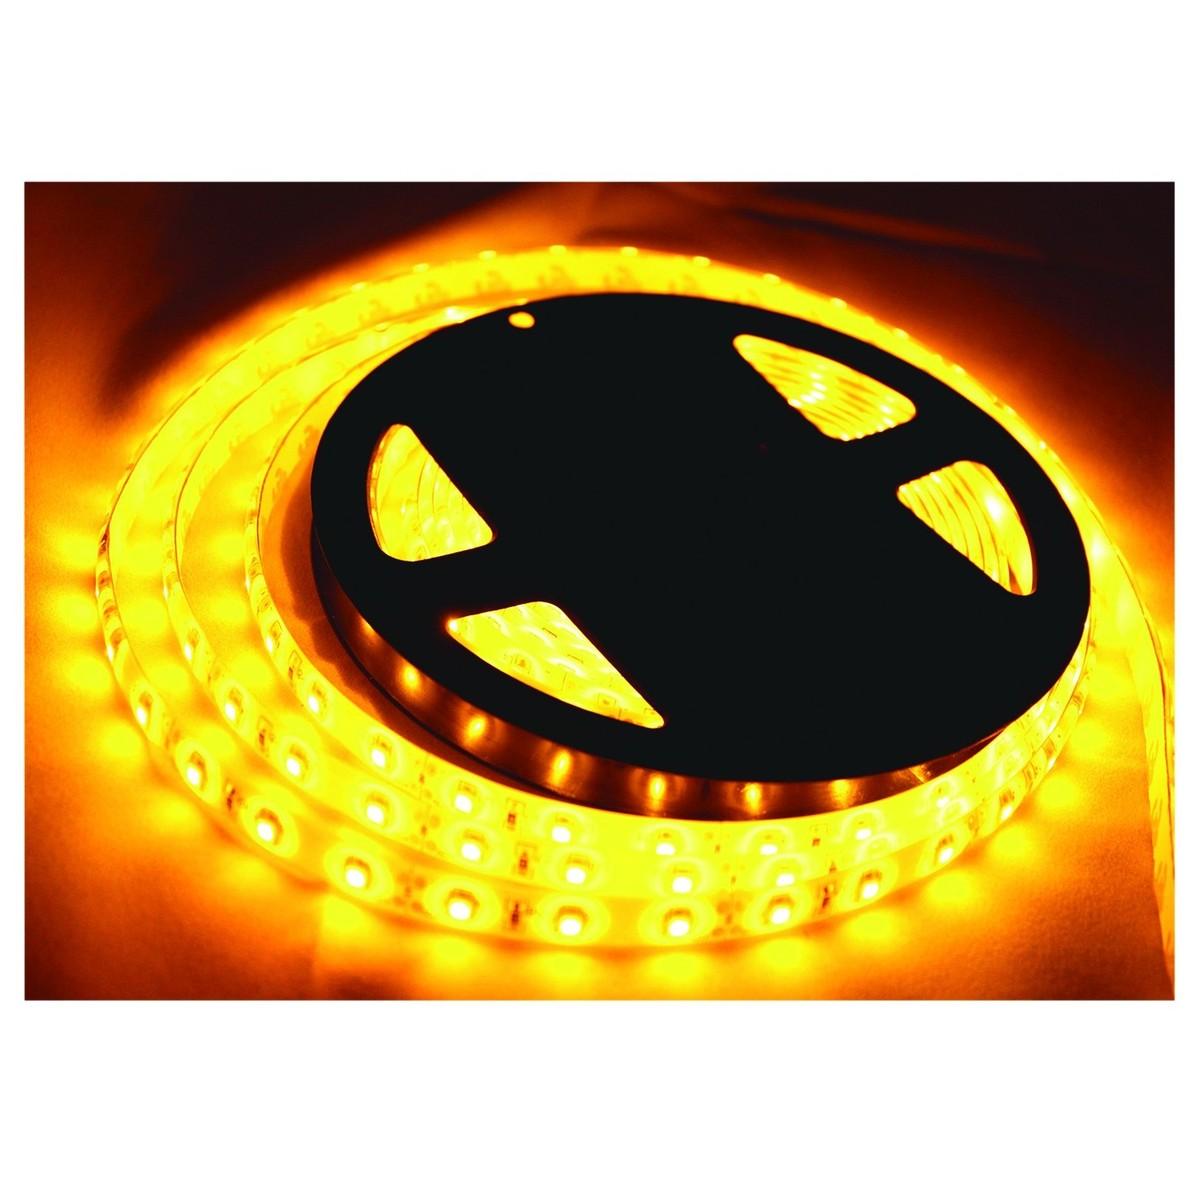 LR Technology LED Tape Light Kit 5M, Yellow at Gear4music